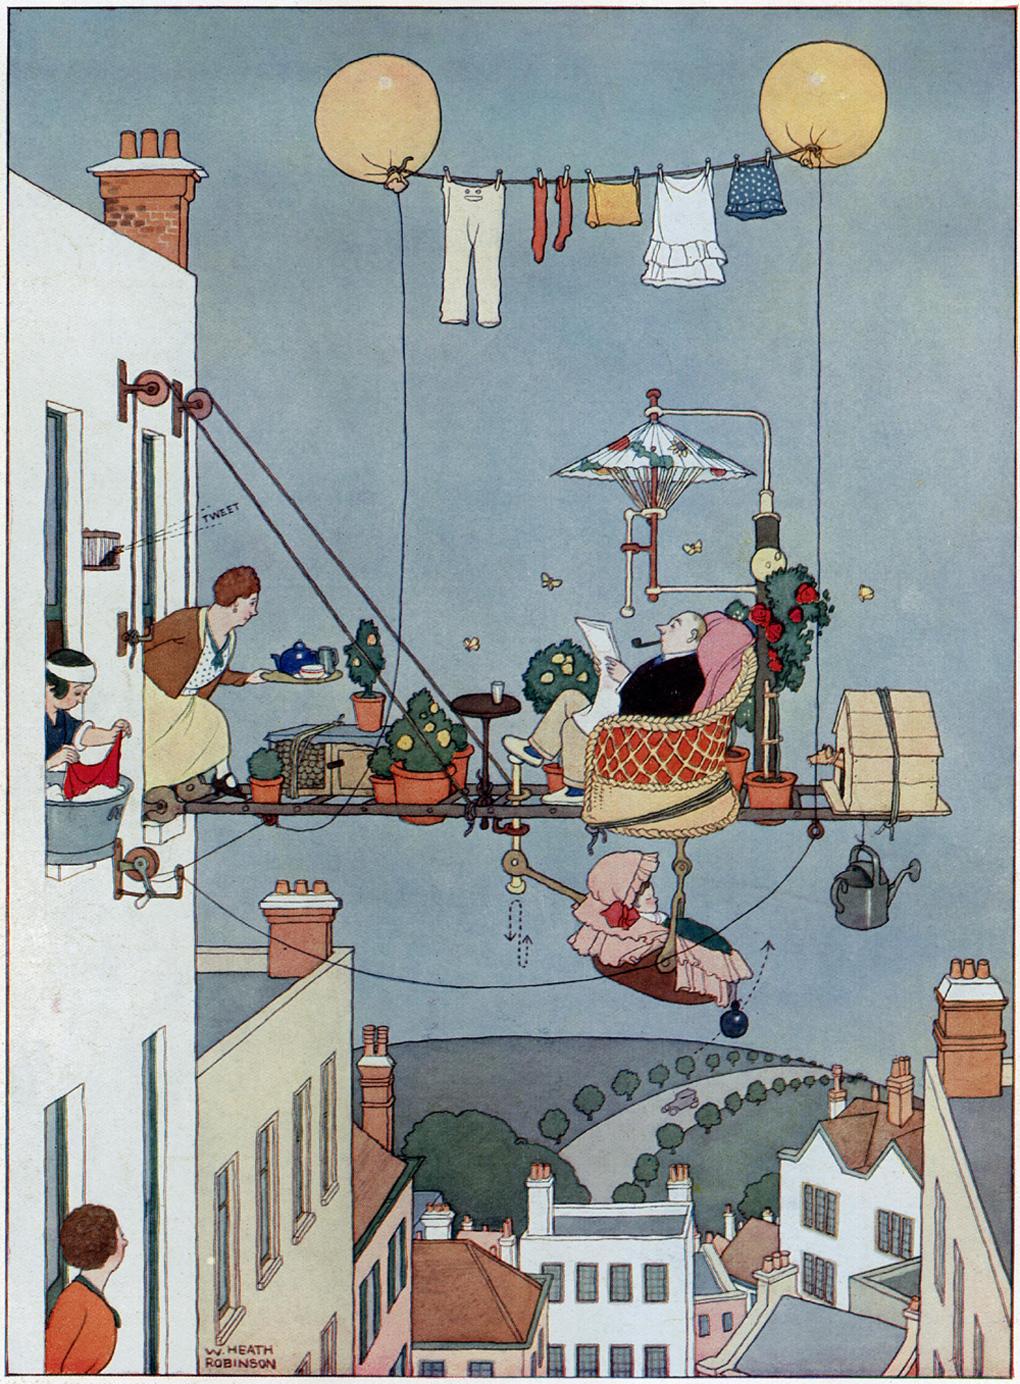 Absurdity and wonder: Heath Robinson at home | The Economist